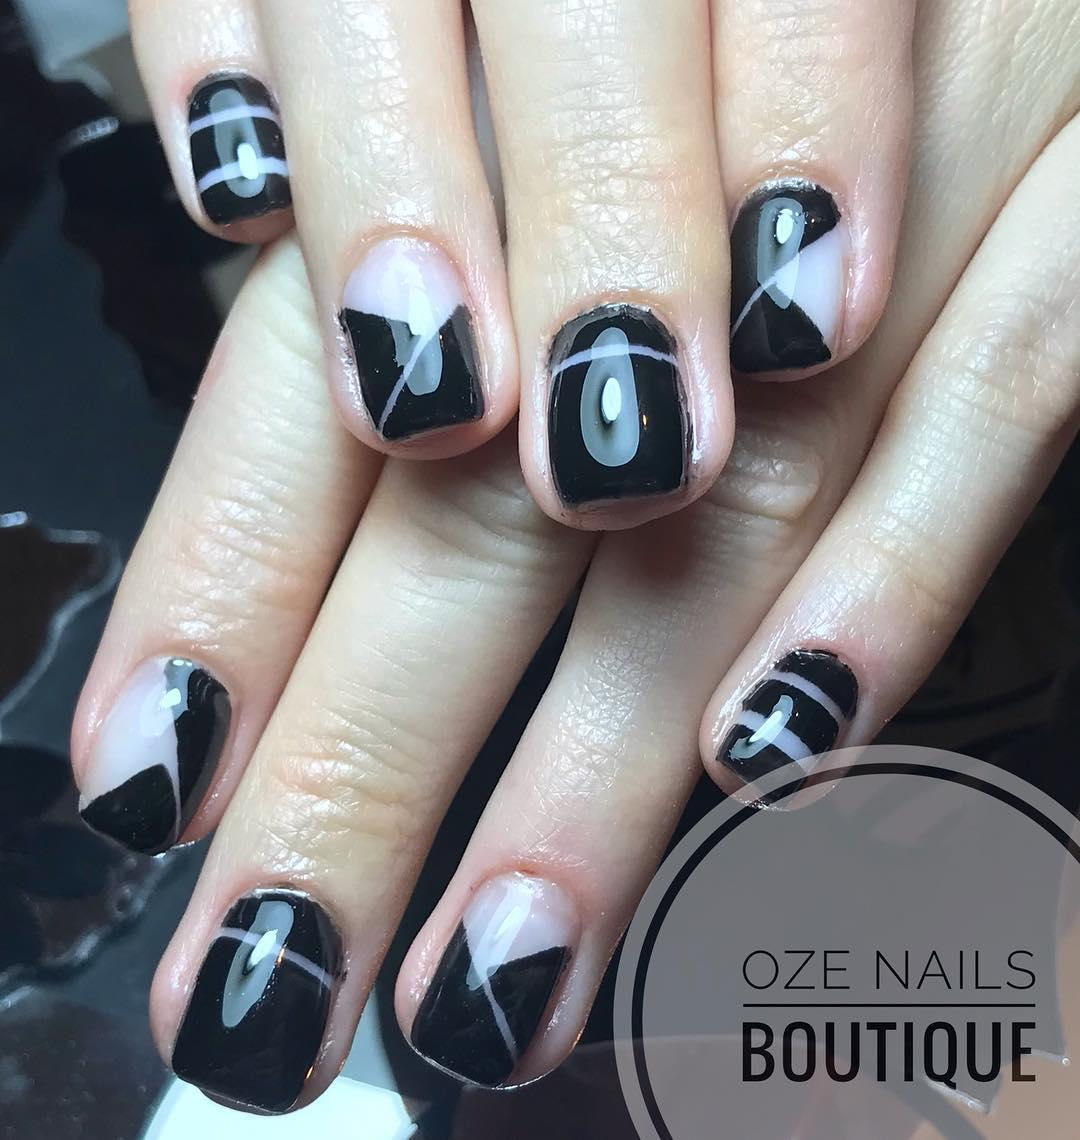 elegant black nail designs 2019 7 - Elegant Black Nail Designs 2019